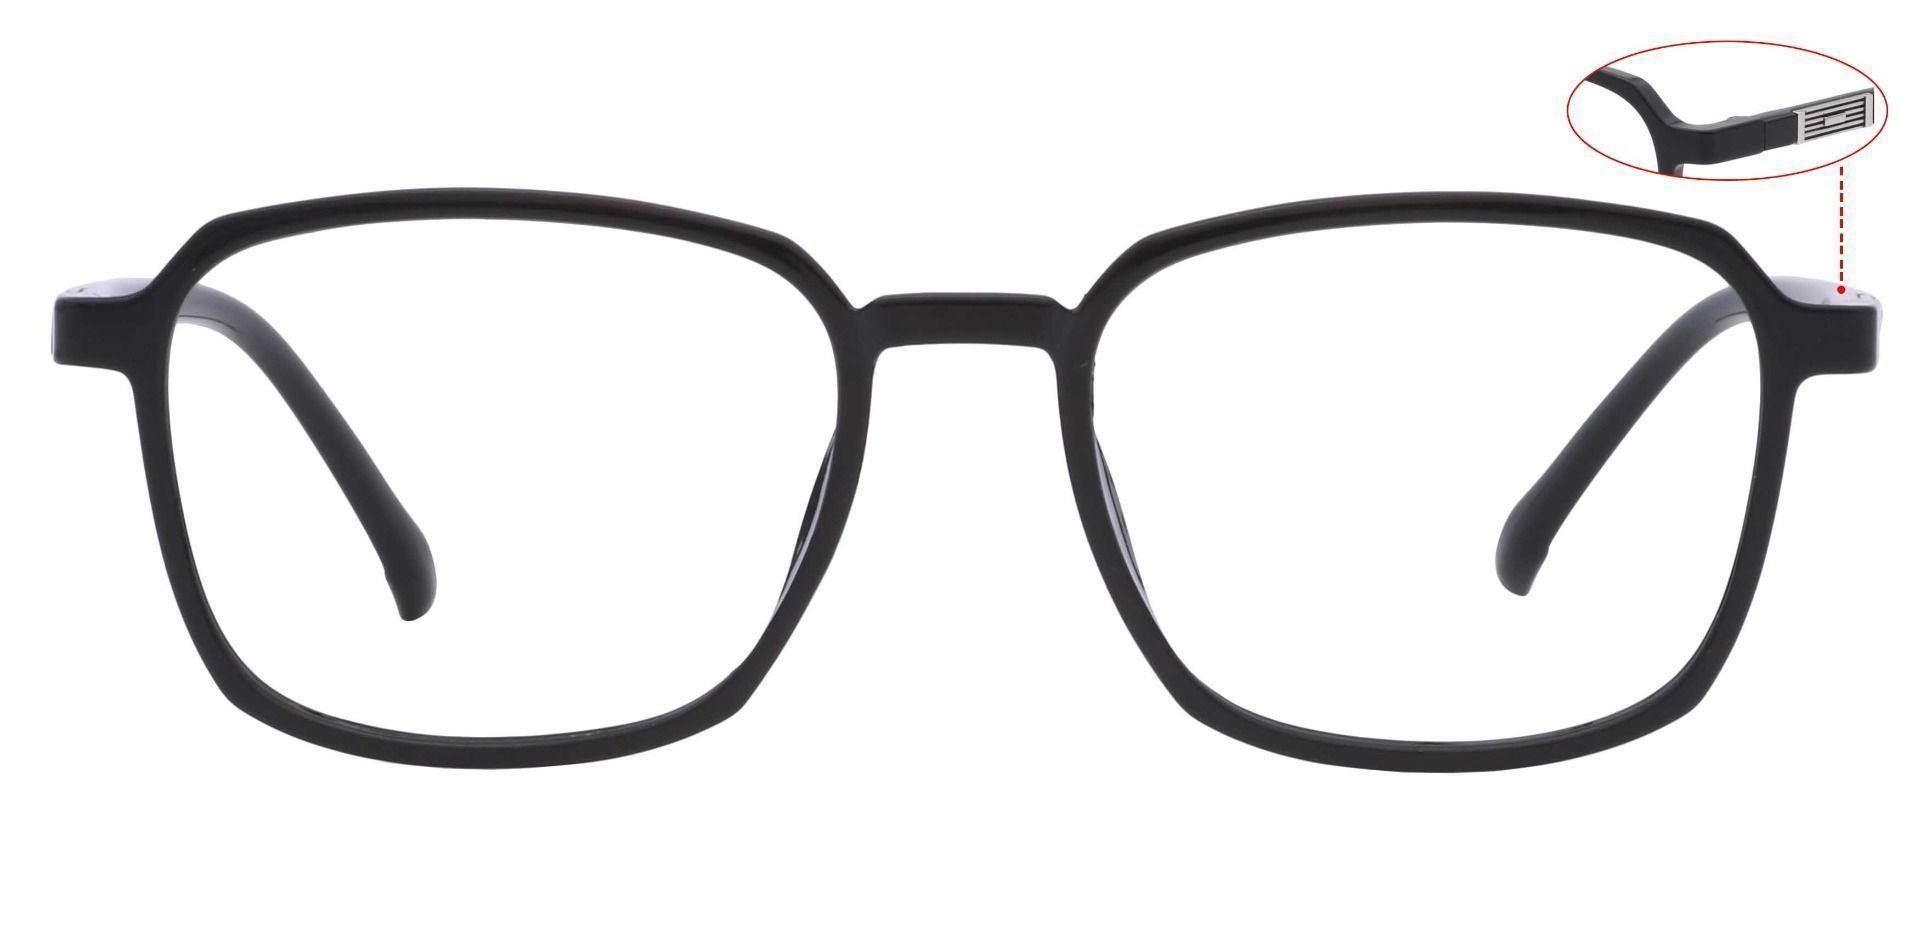 Stella Square Blue Light Blocking Glasses - Black